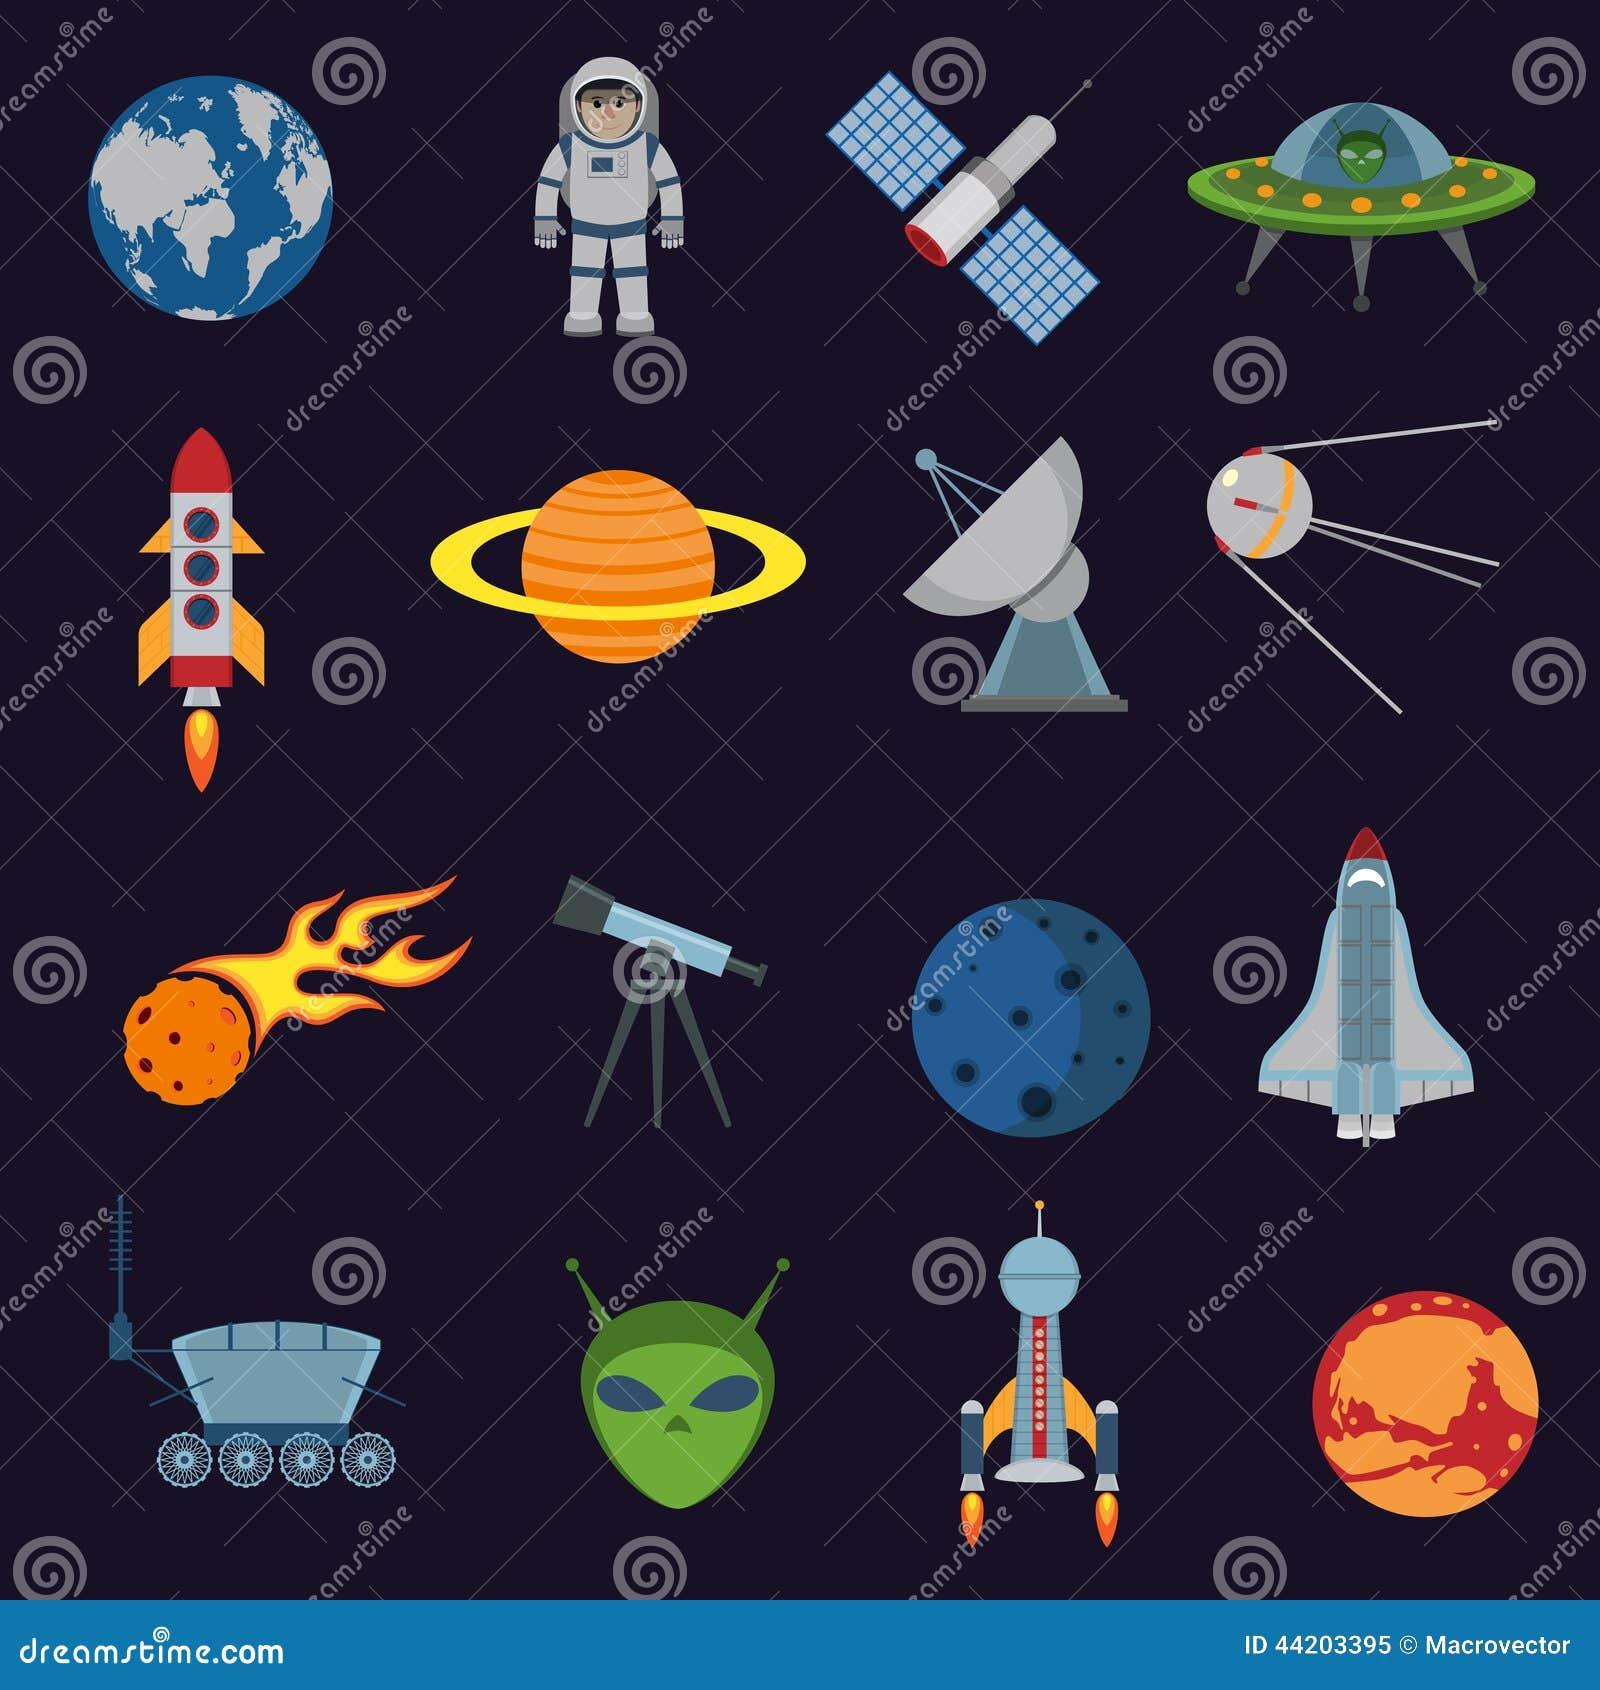 3d animation alien 1 5